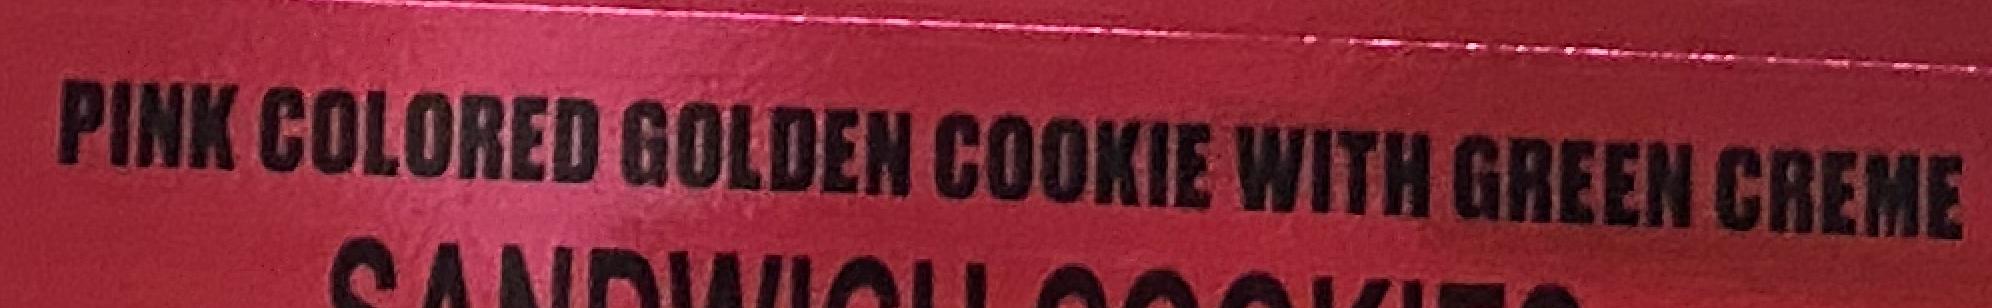 Make it sound less appetizing please